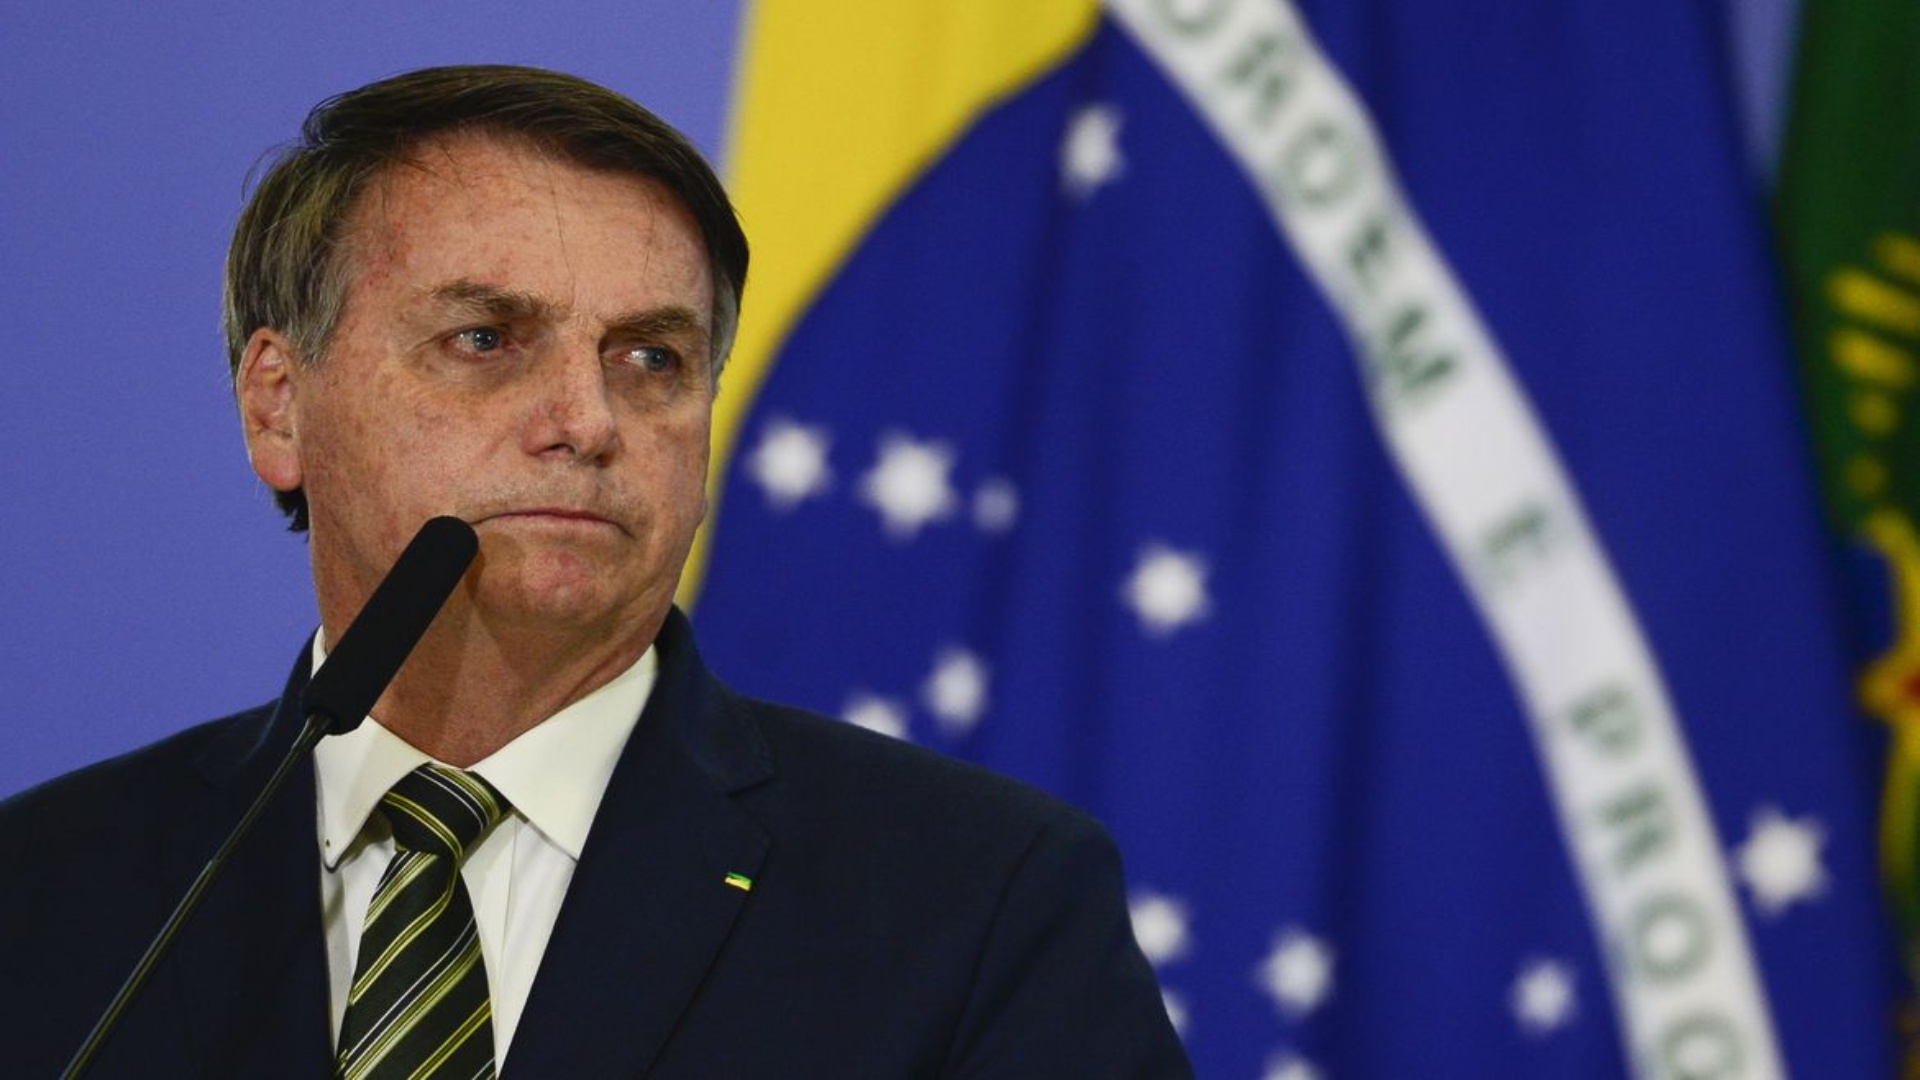 presidente jair bolsonaro 2